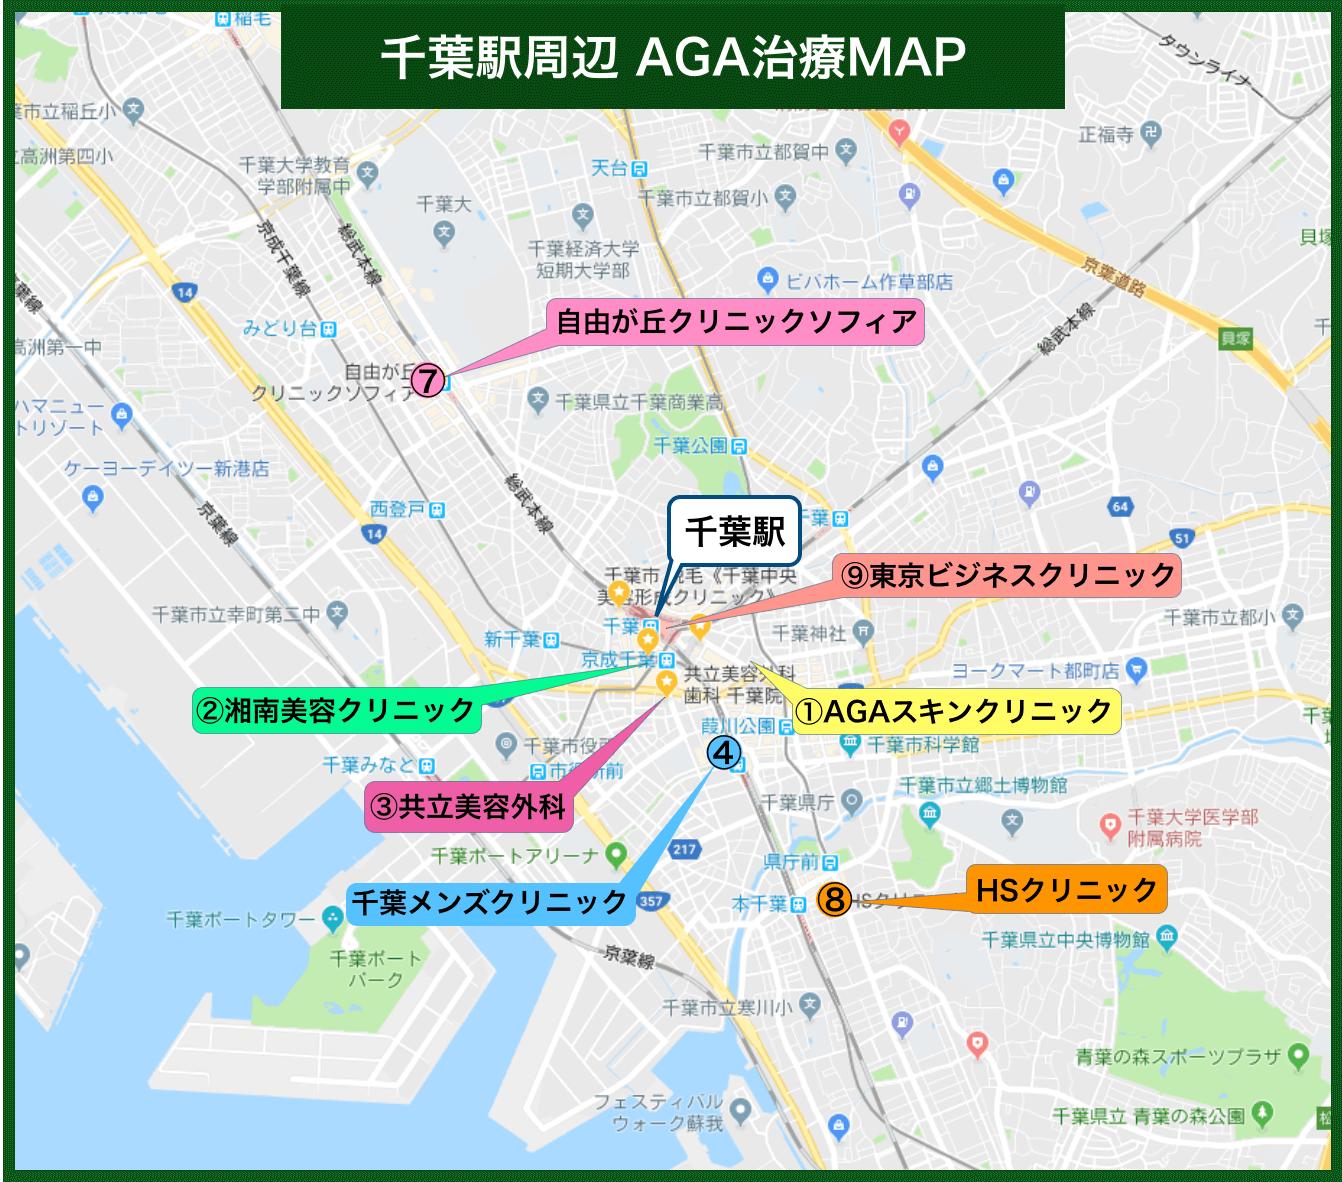 千葉駅周辺 AGA治療MAP